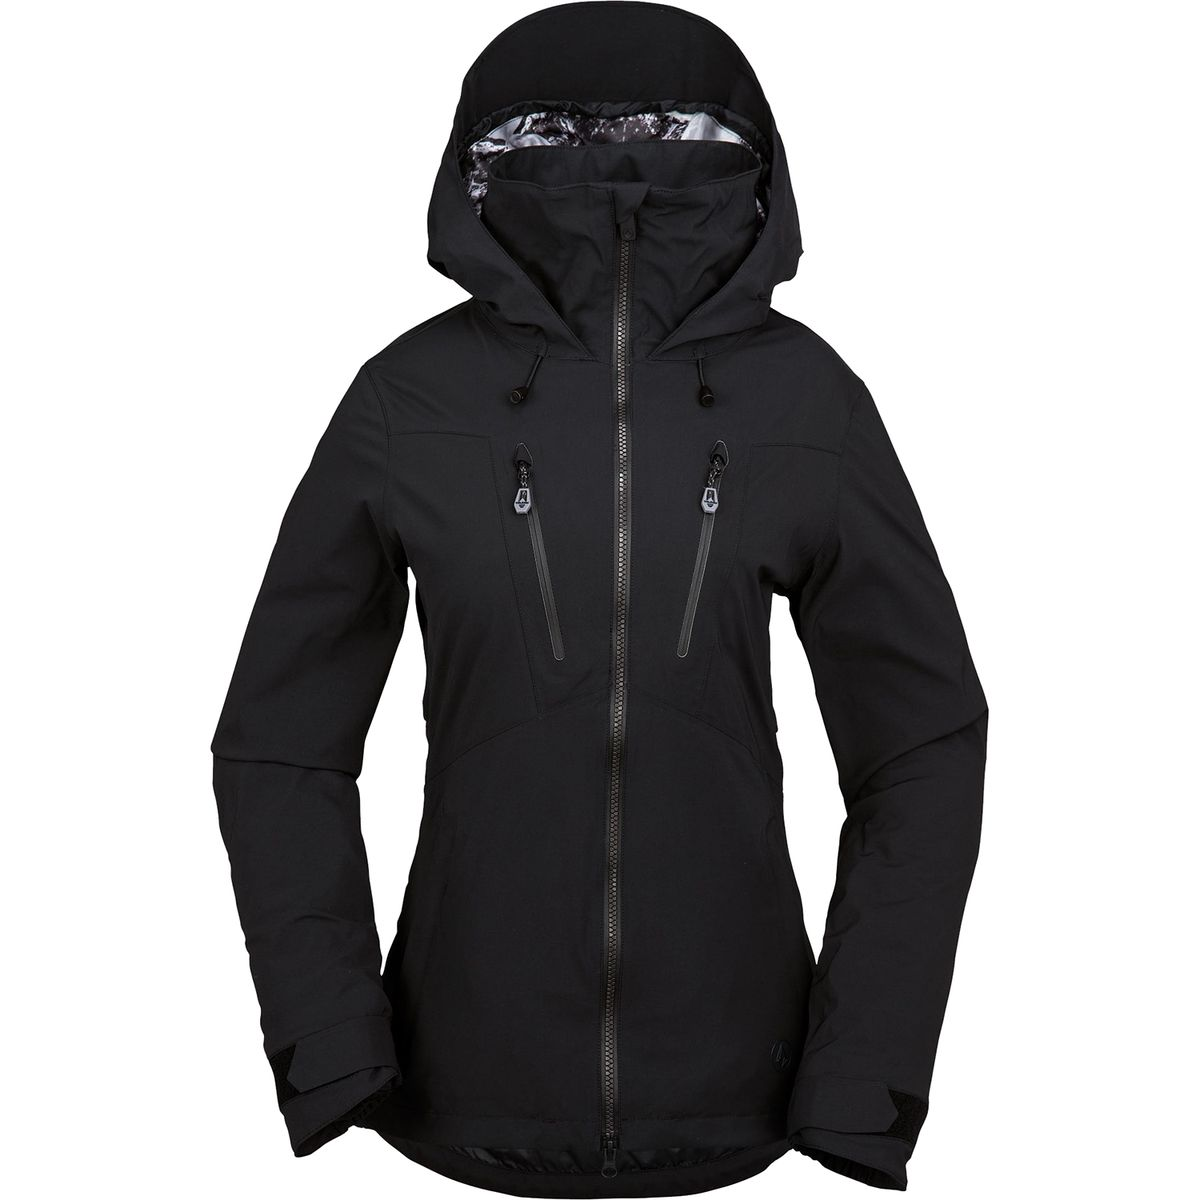 Volcom PVN Gore-Tex Stretch Jacket - Women